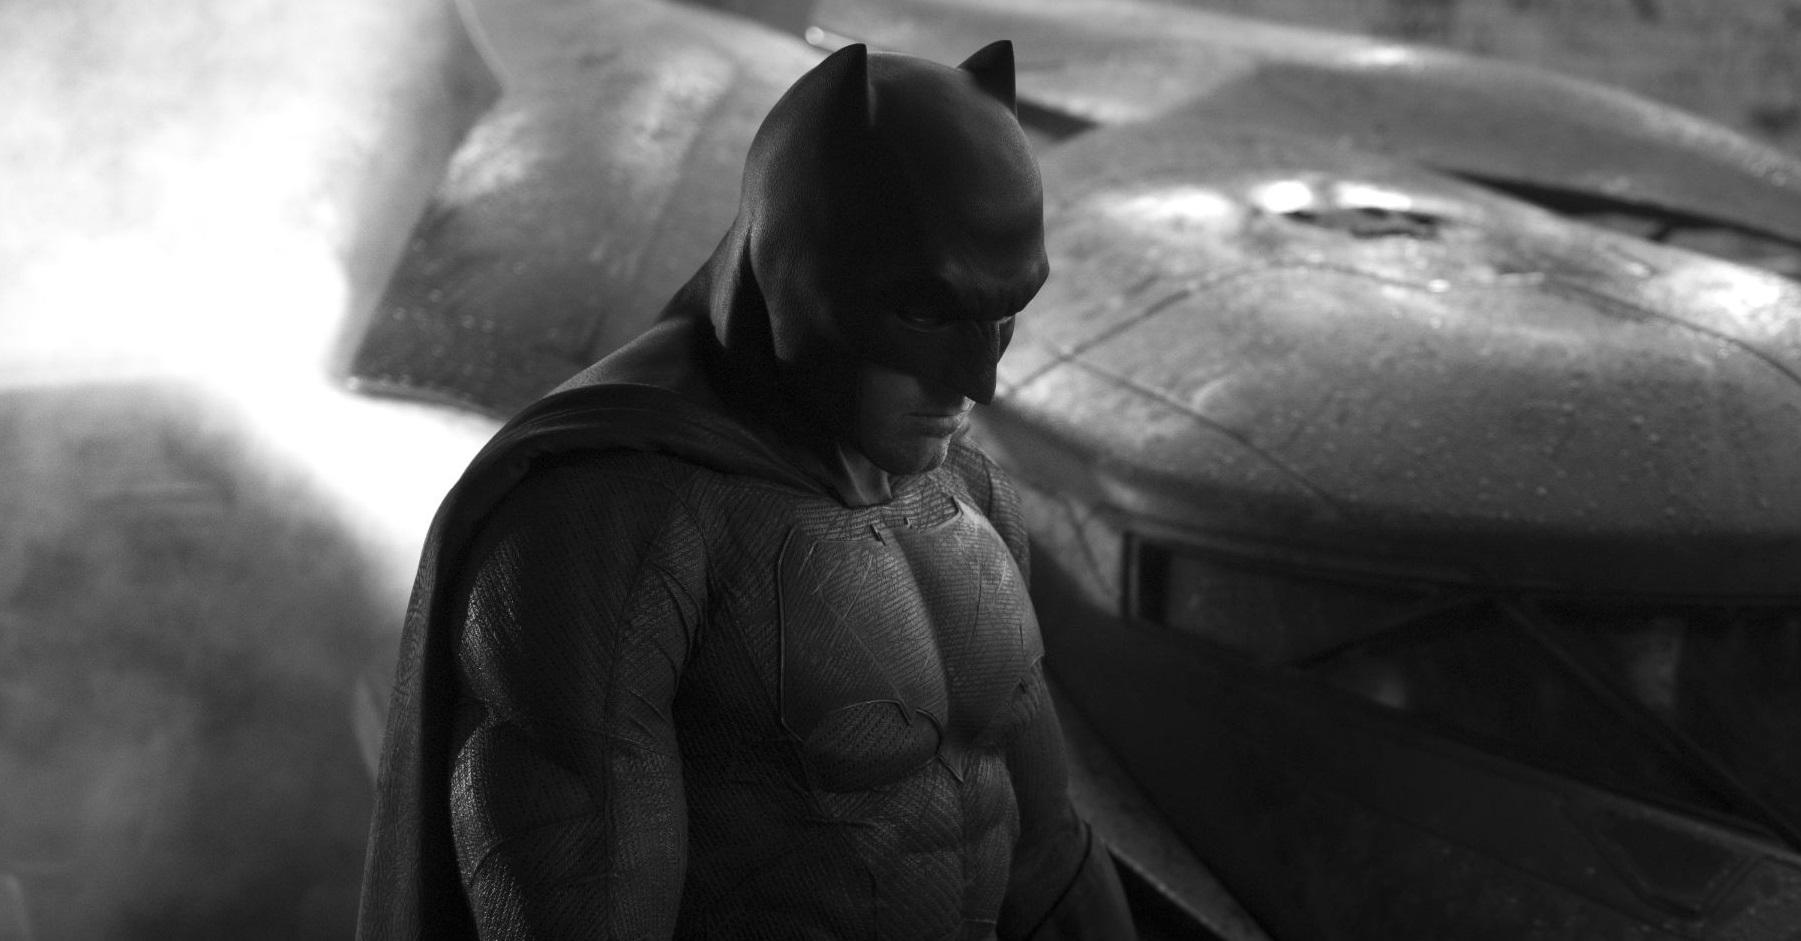 first look at ben affleck as batman and batmobile in